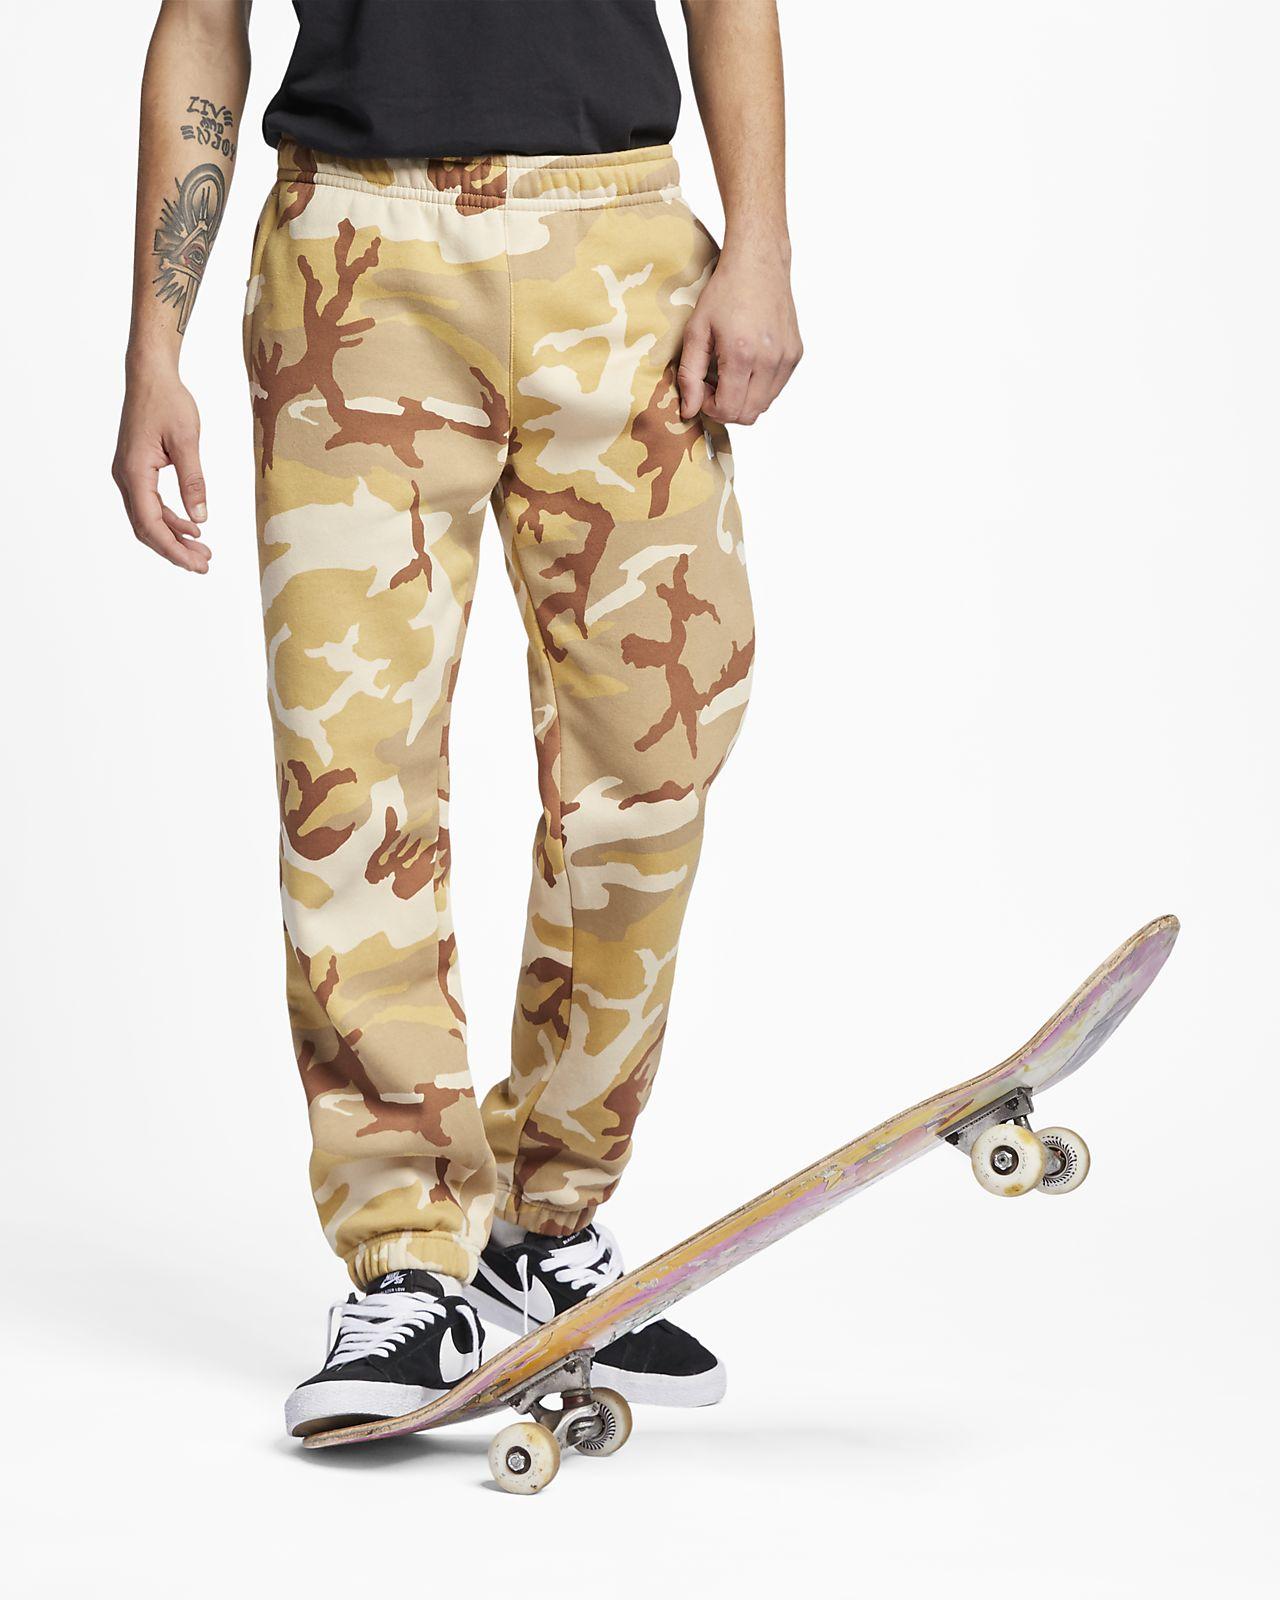 Icon De Sb Pantalón Camuflaje Nike Skateboard Es Hombre xSFPwwq5t 5869fa0ab1b